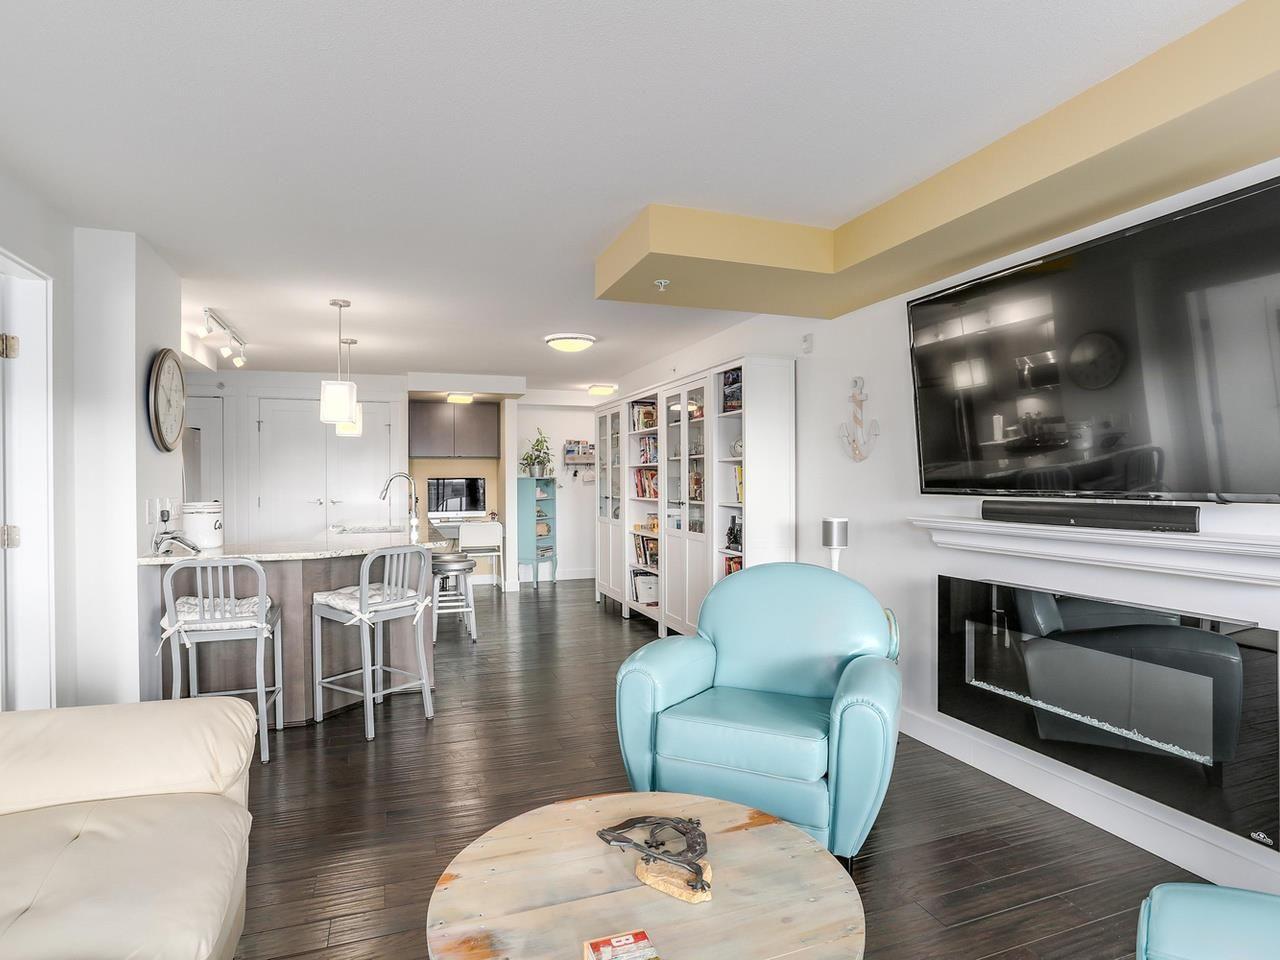 "Photo 5: Photos: 202 14955 VICTORIA Avenue: White Rock Condo for sale in ""SAUSALITO BEACH SIDE LIVING"" (South Surrey White Rock)  : MLS®# R2128764"